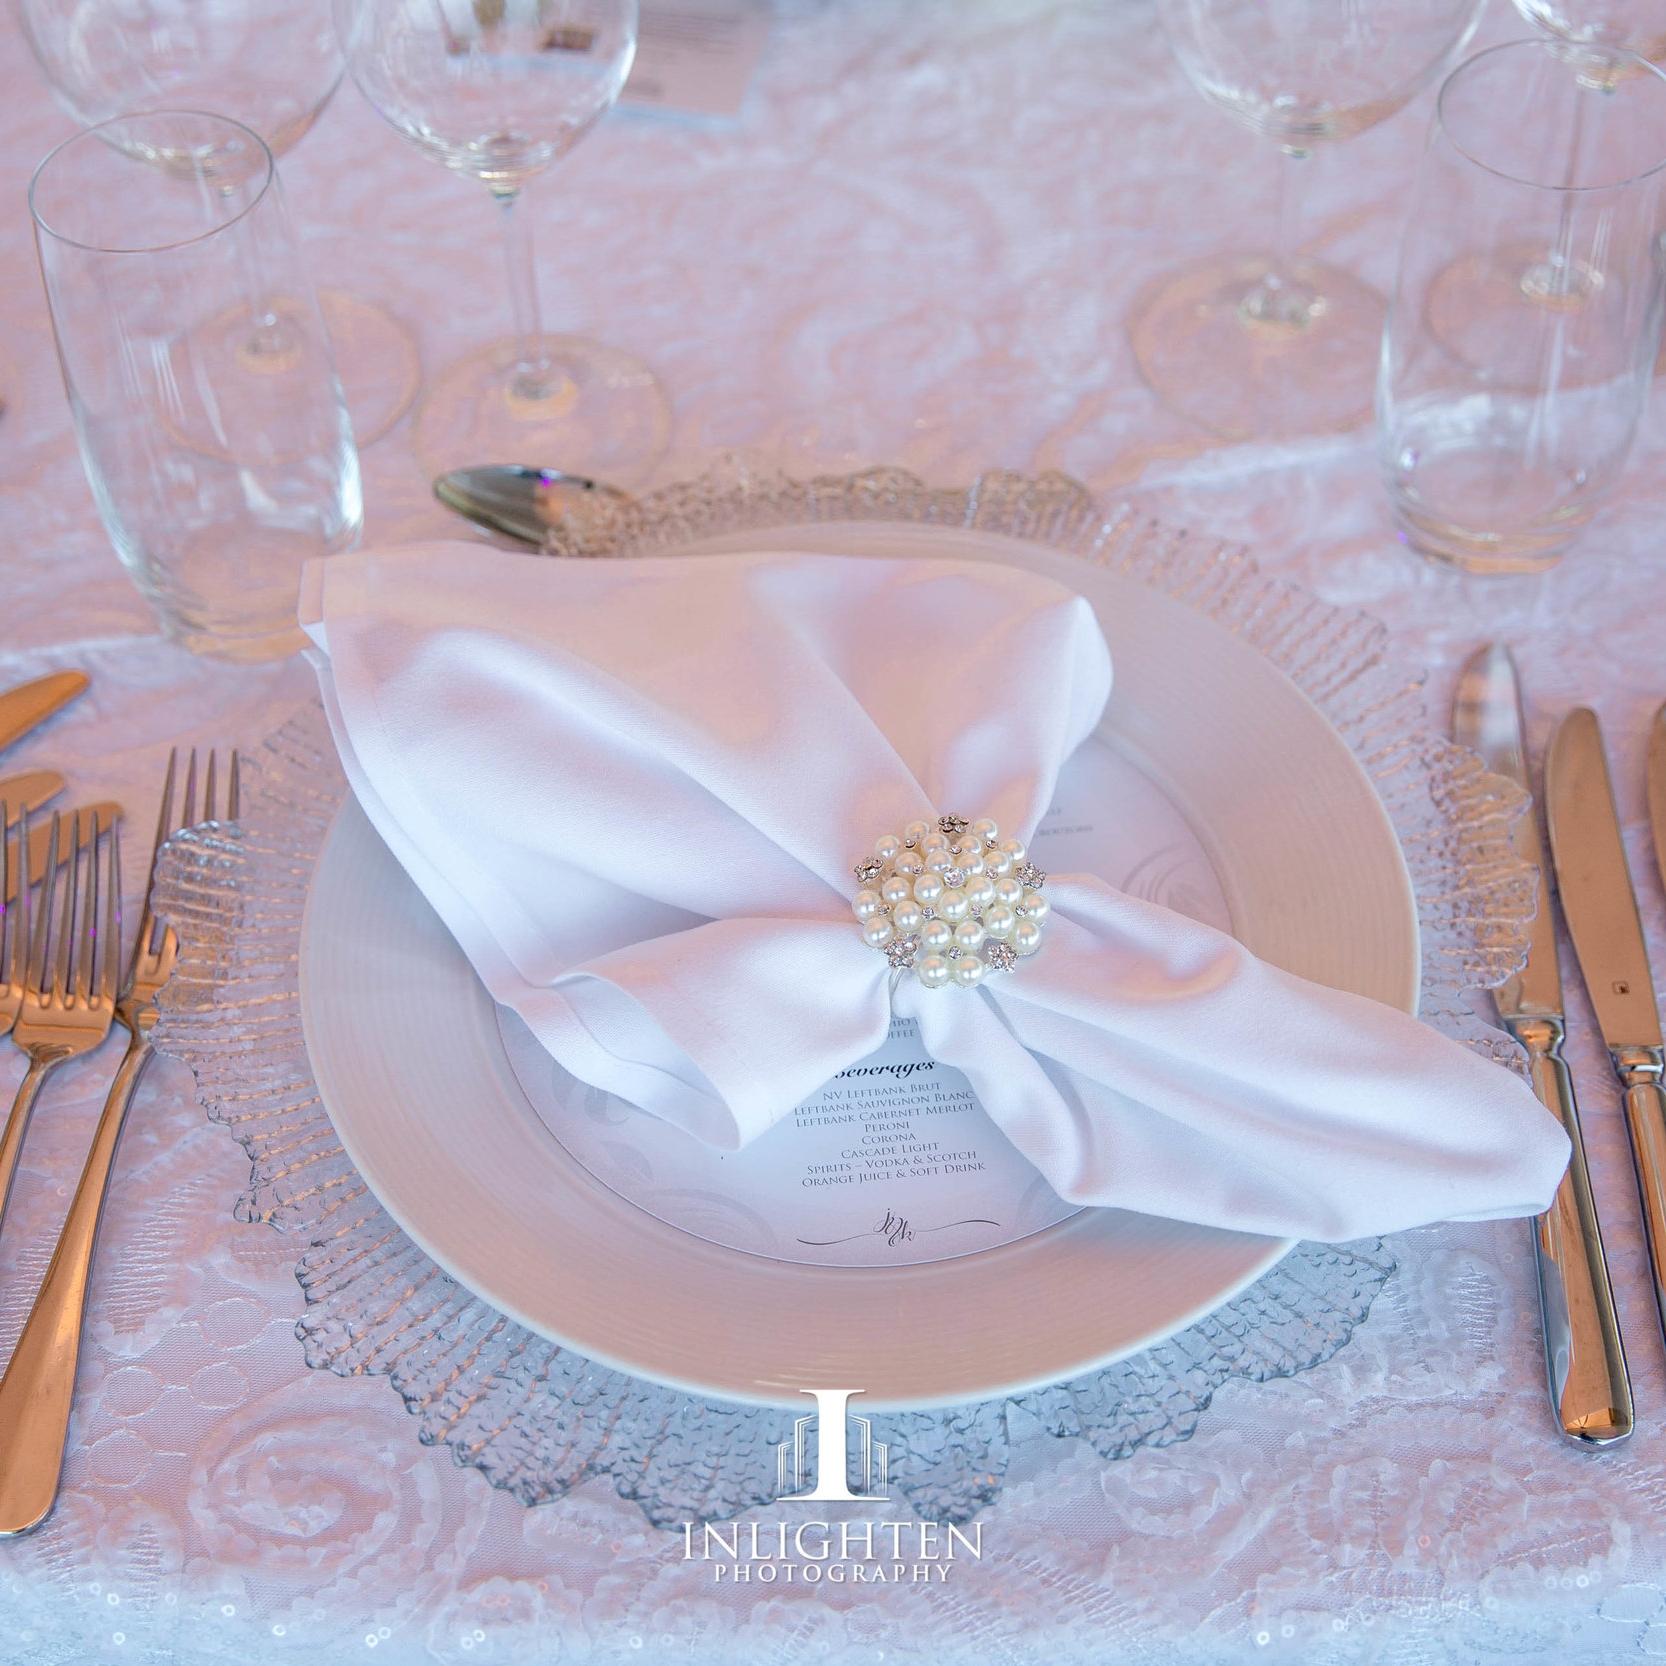 pearl_napkin_ring_sydney_hire_decorative_items.jpg